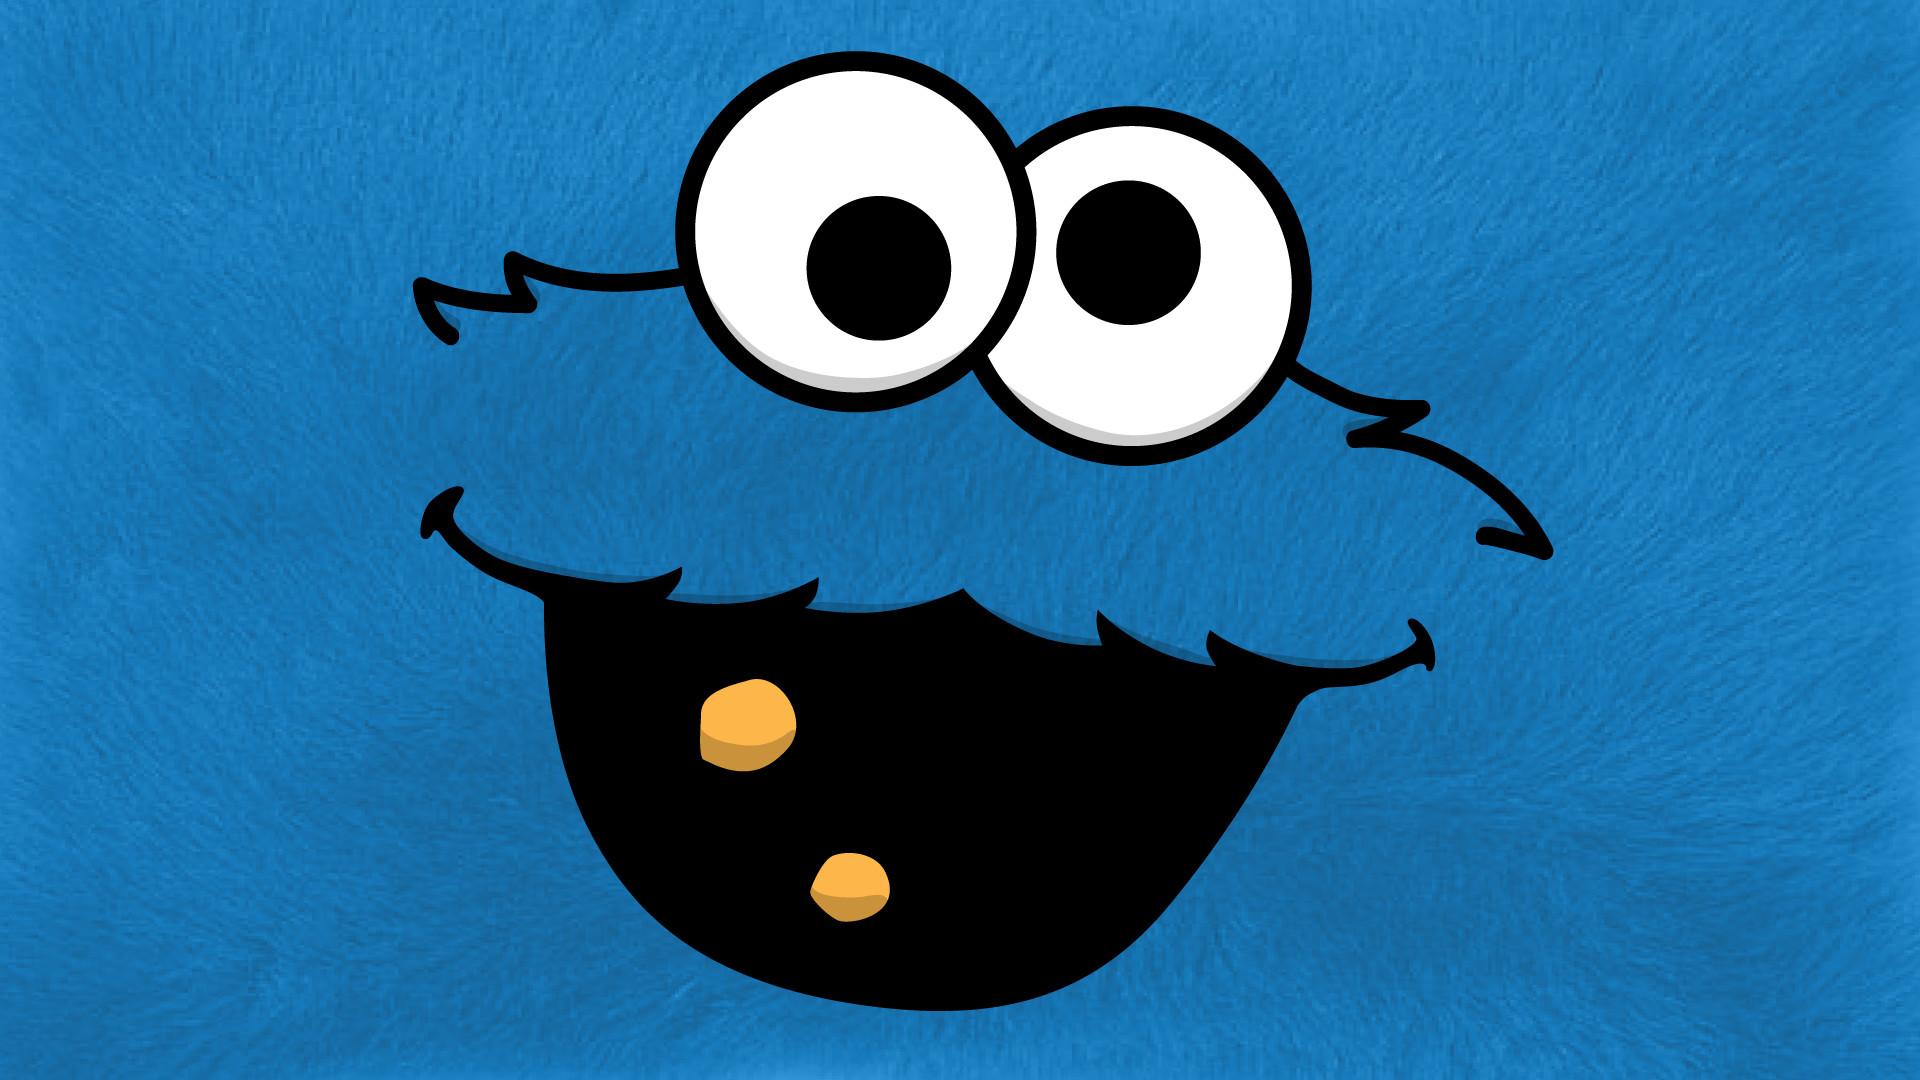 Cookie Monster Hd Desktop Cookie Monster Mobile Wallpaper Cookie Monster Blue Background 1920x1080 Download Hd Wallpaper Wallpapertip